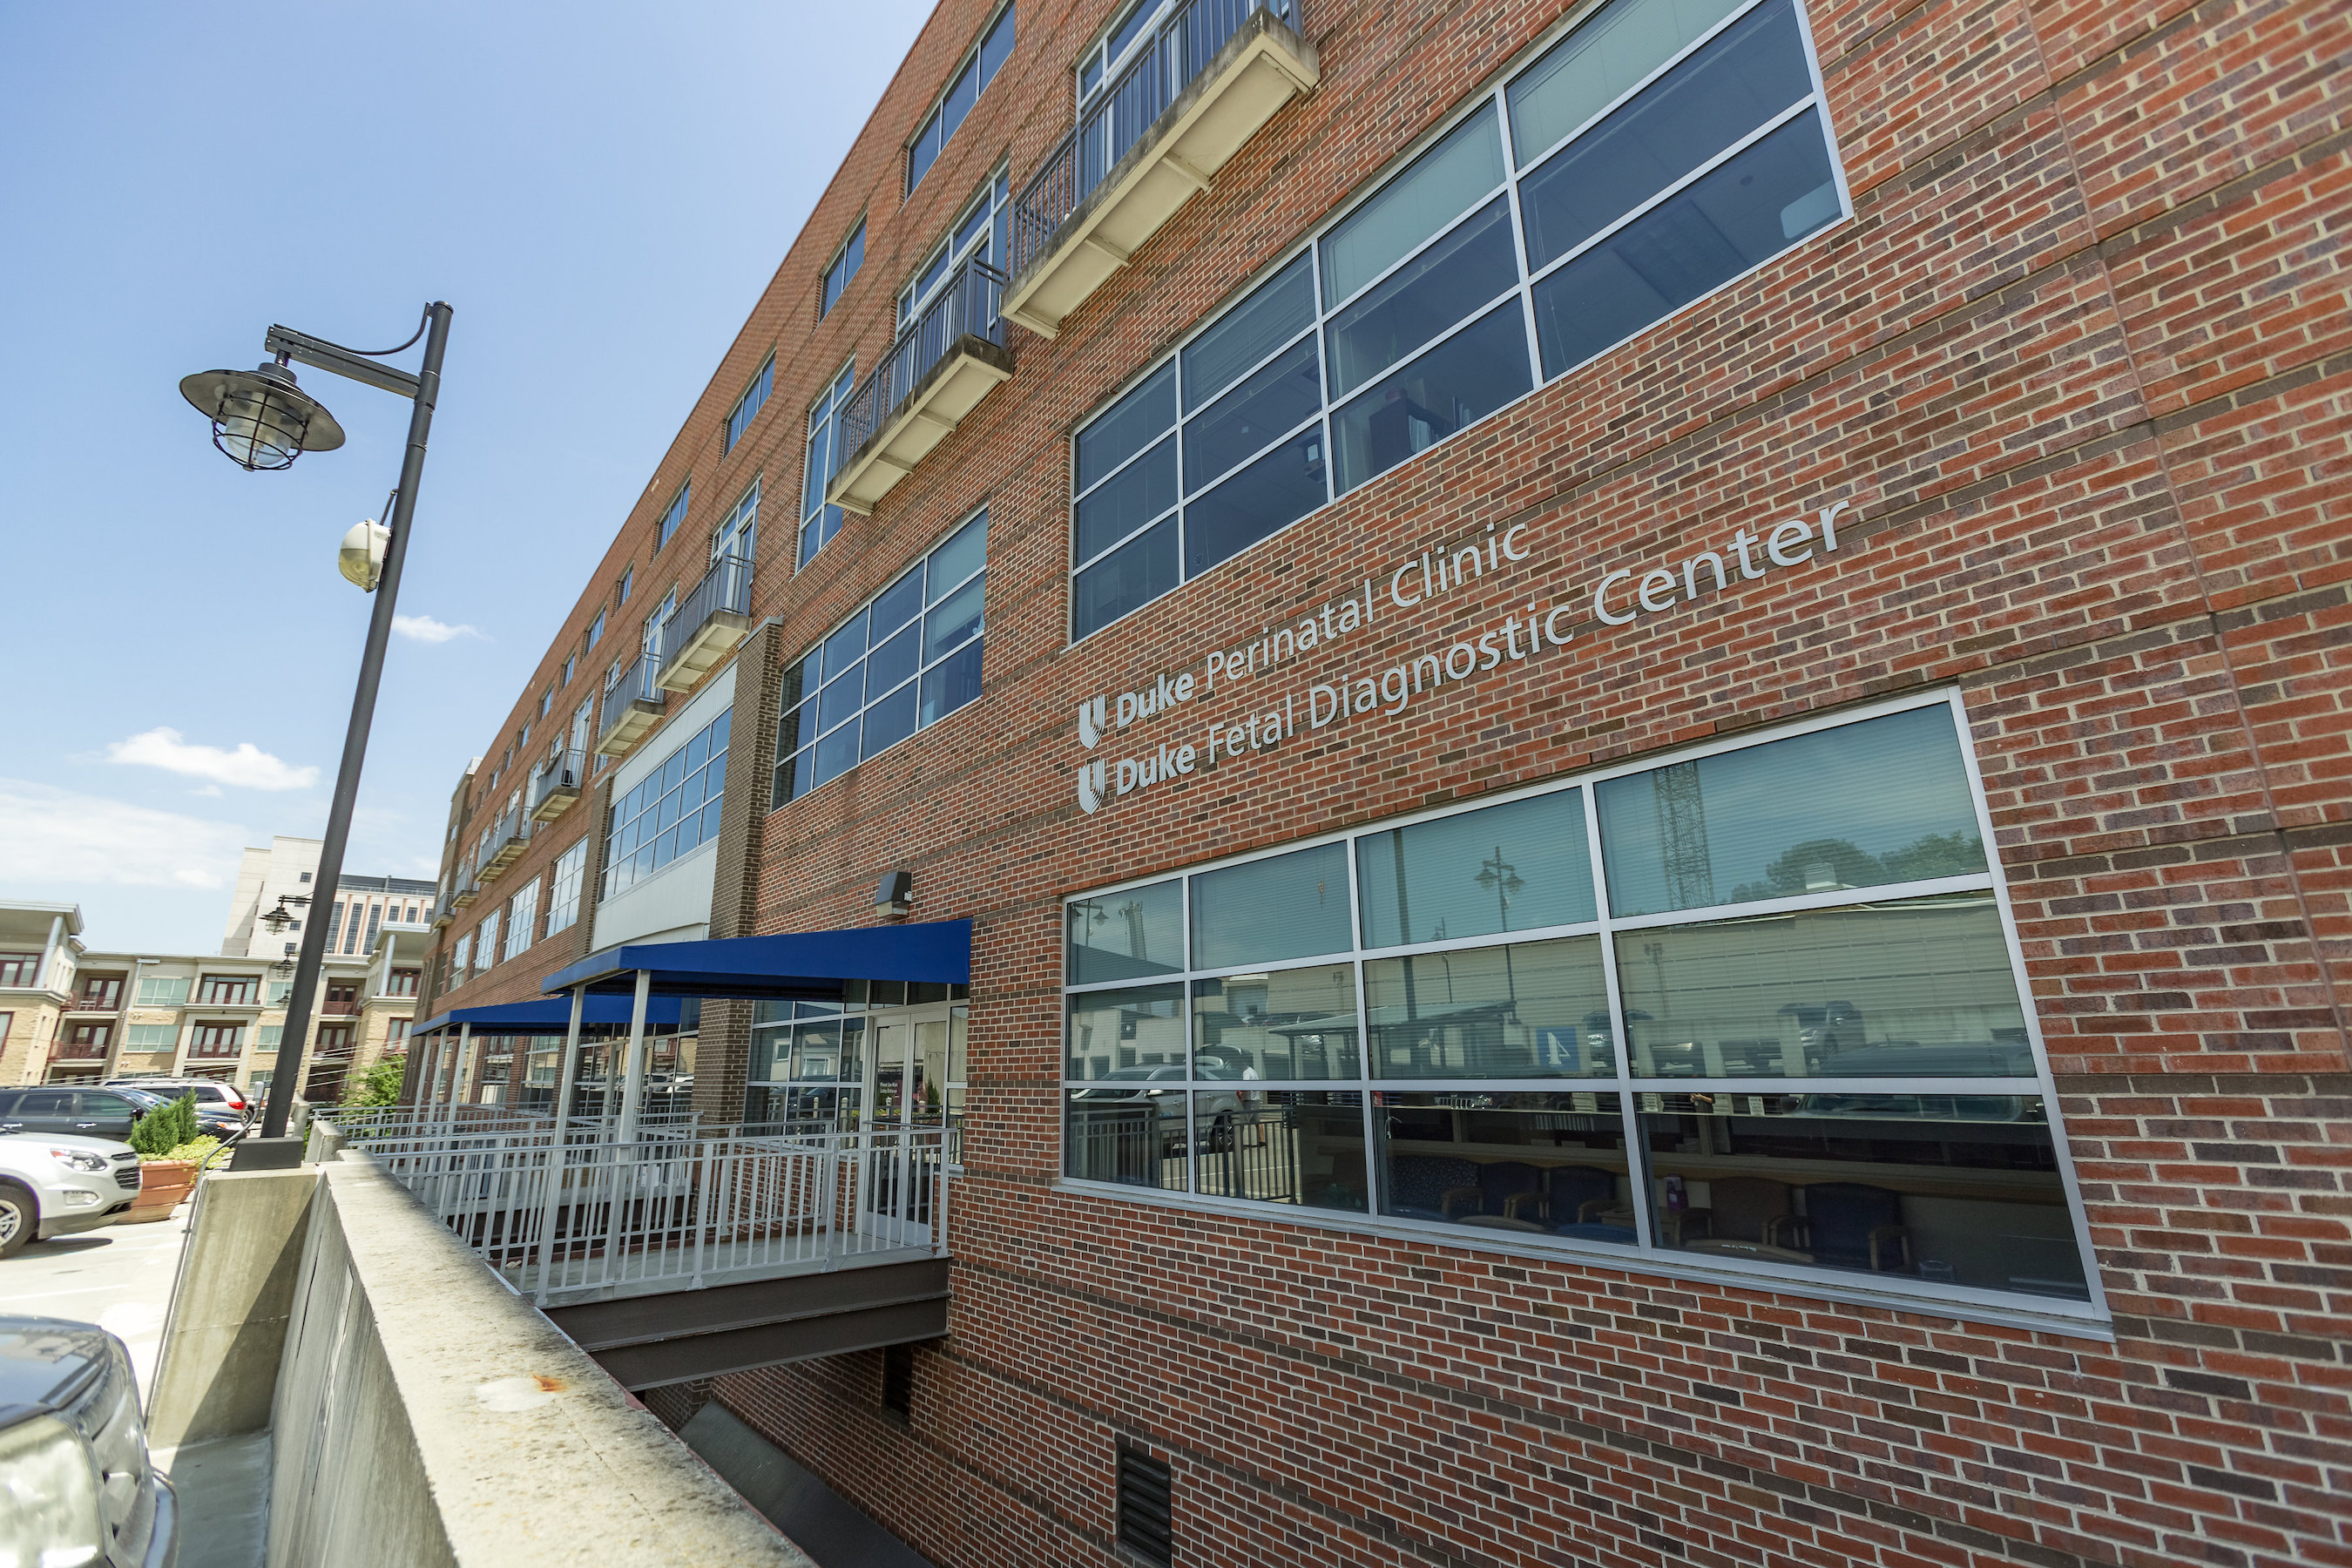 Perinatal Consultants of Durham and Fetal Diagnostic Center